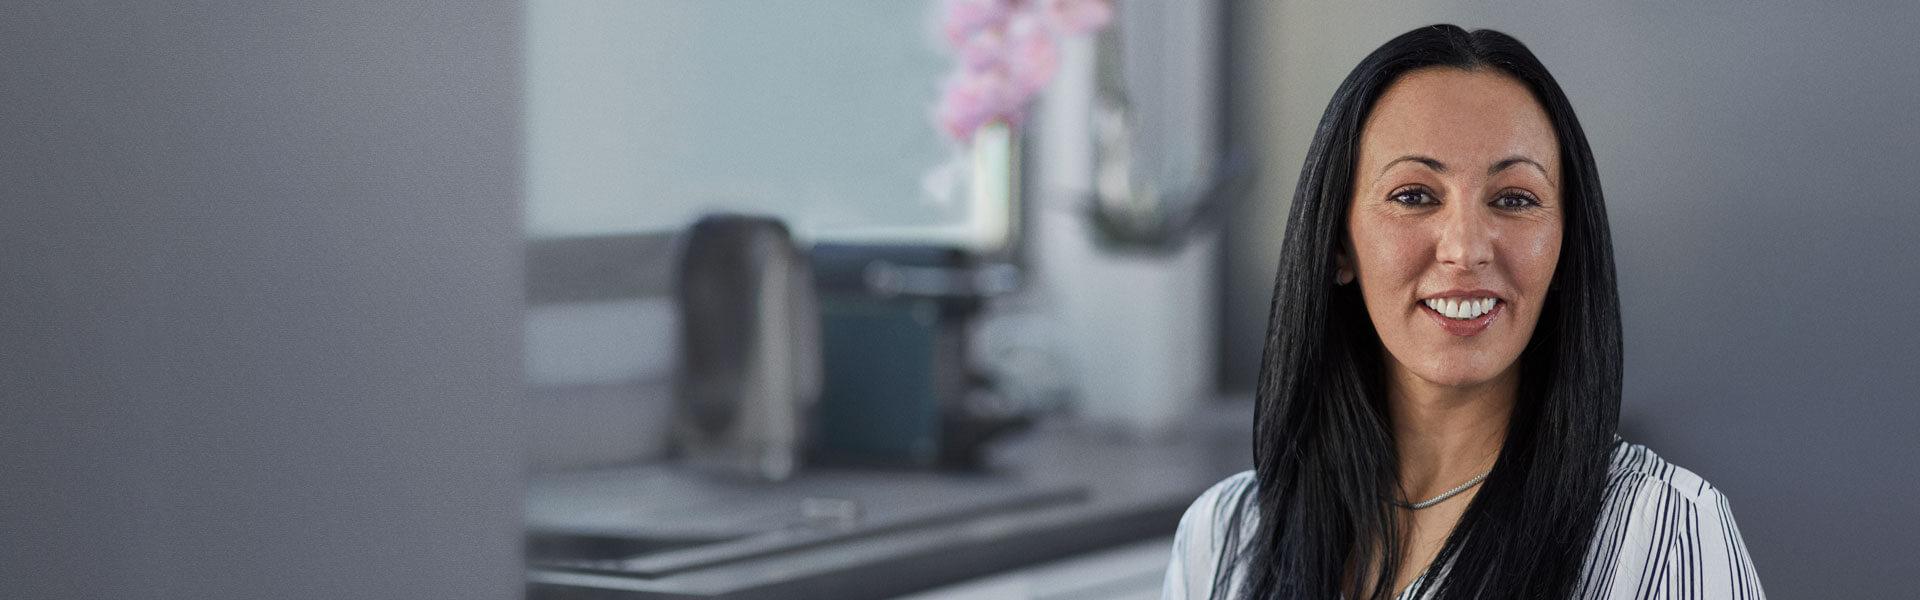 Meet Samia - an Oticon Medical cochlear implant user